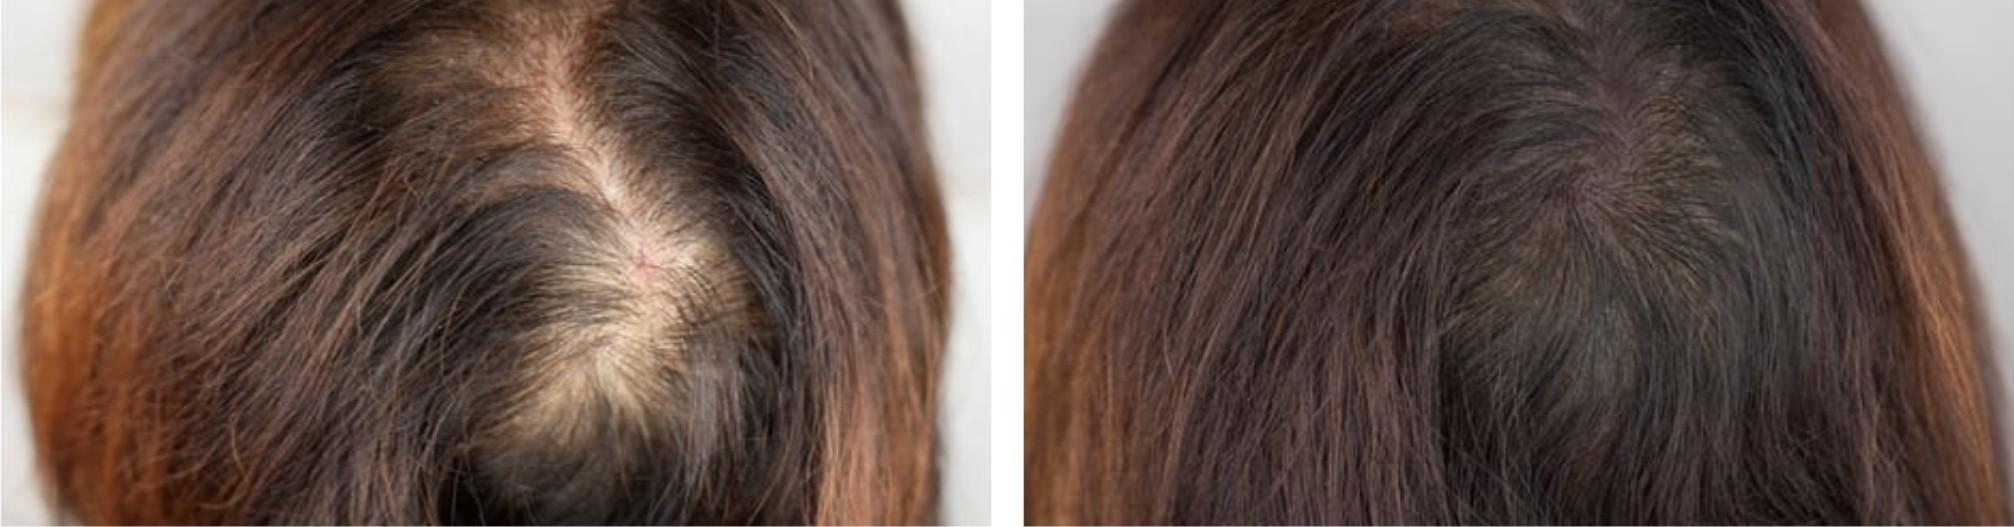 Hair Follicle Simulation Image One